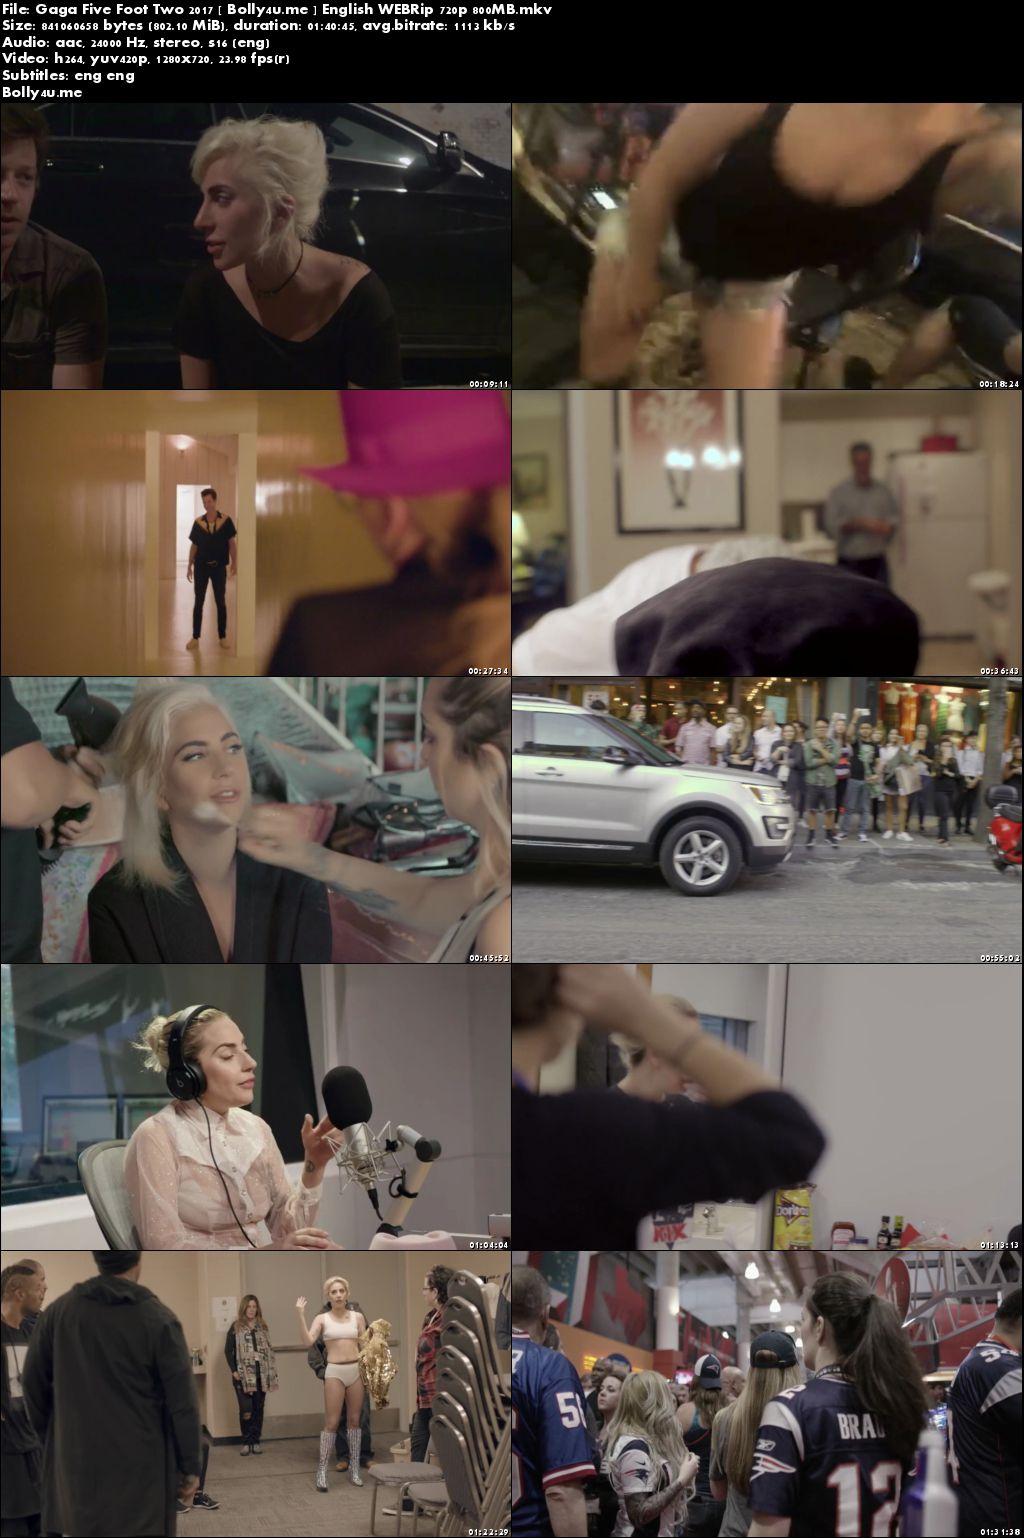 Gaga Five Foot Two 2017 WEBRip 800MB English Movie 720p Download